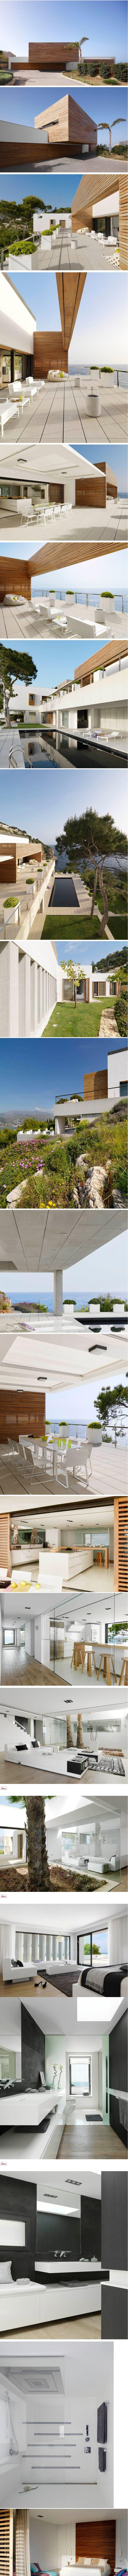 Spectacular housing in Almuñecar, Granada, by Susanna Cots designed back in 2010